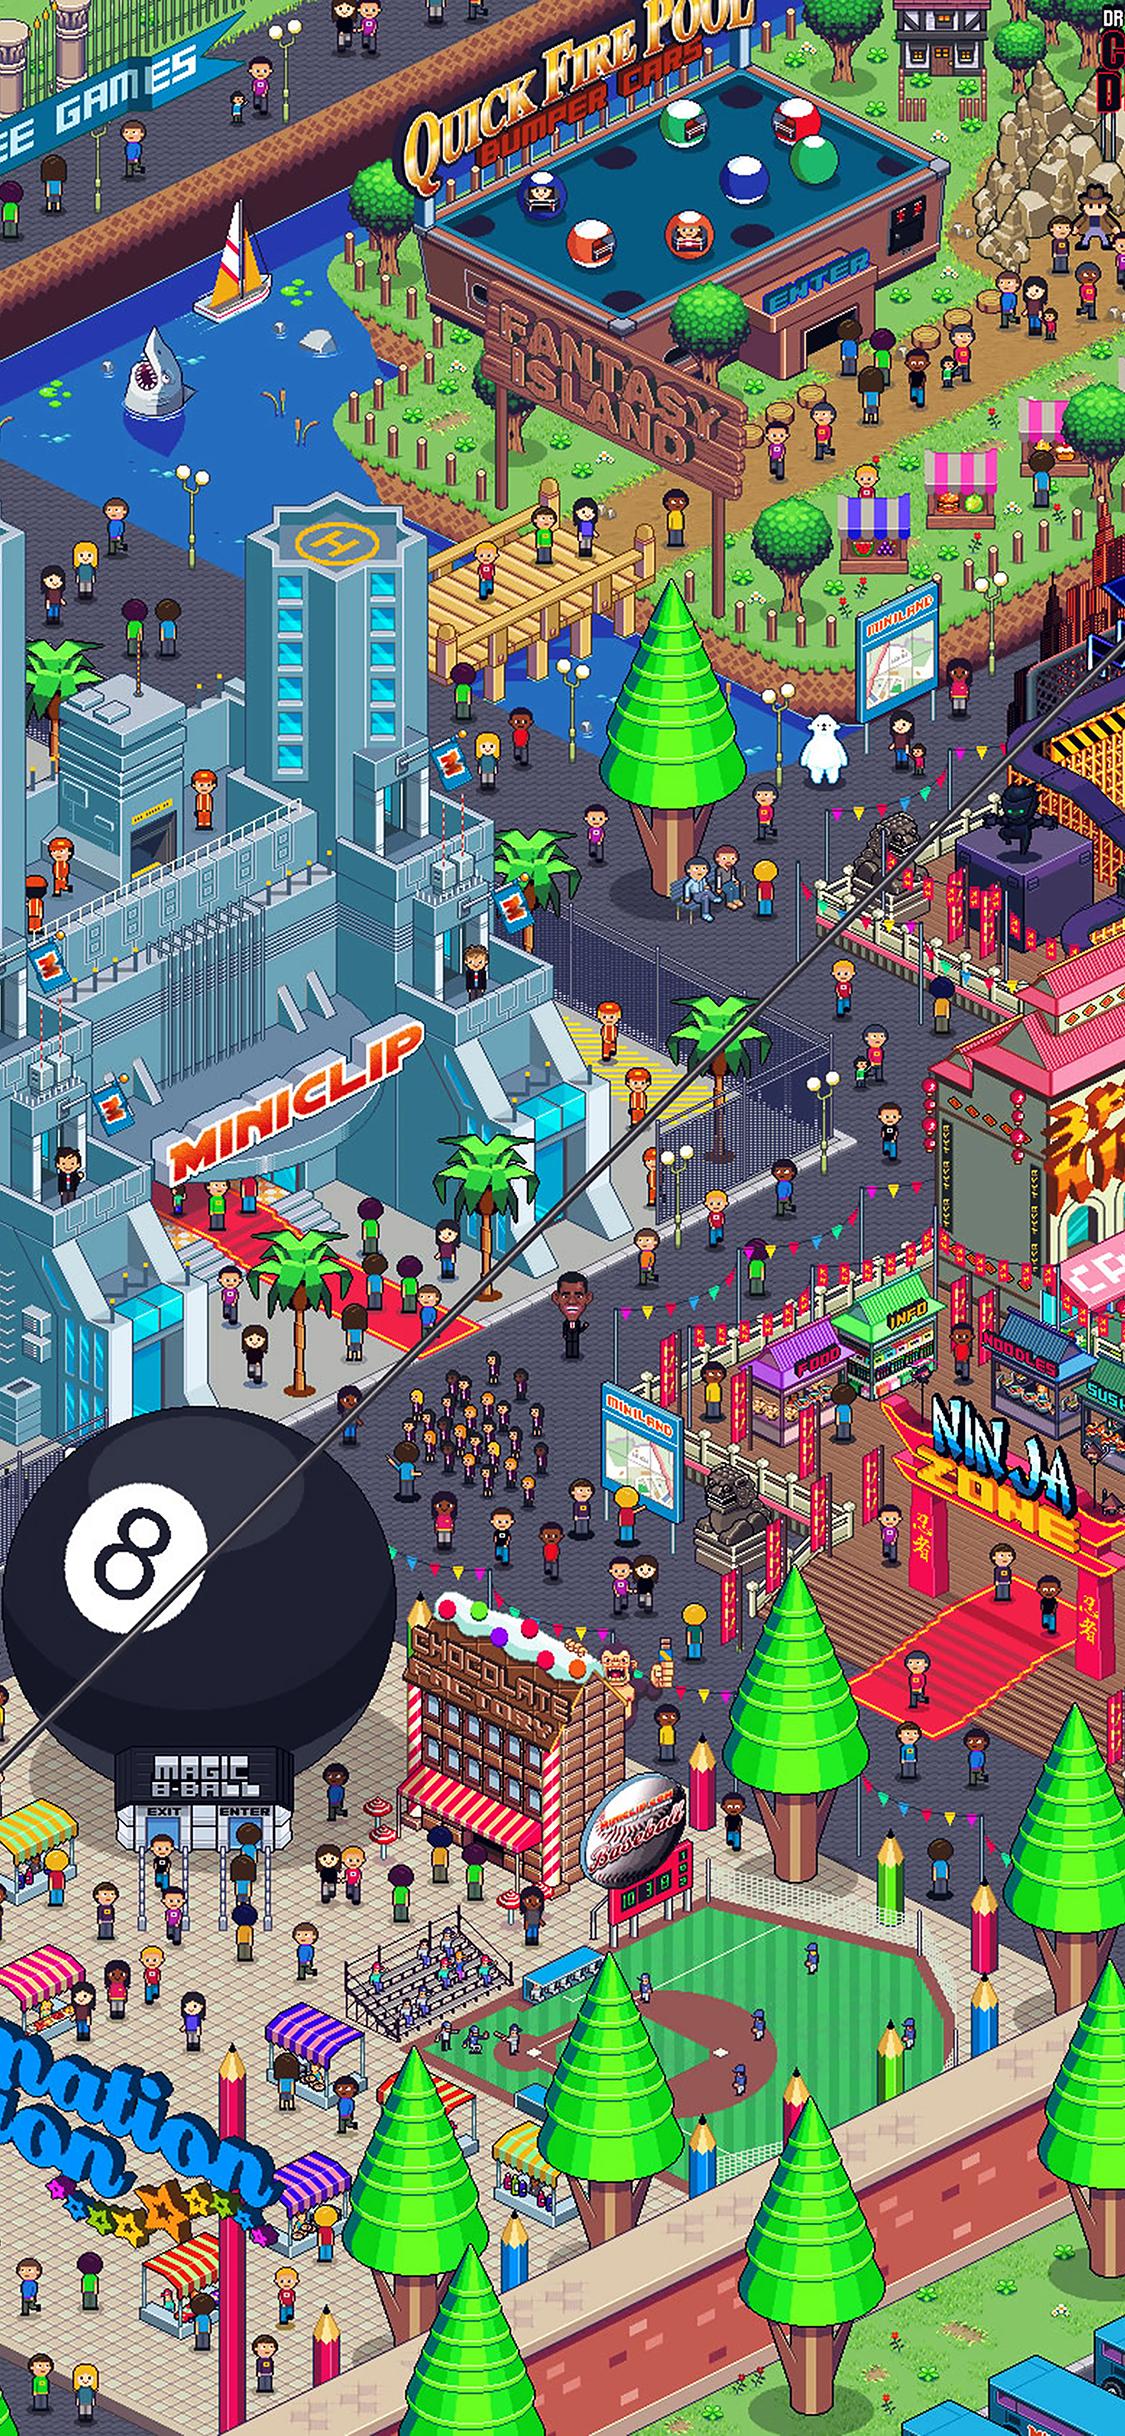 Iphonexpapers Com Iphone X Wallpaper Aj26 Pixel Art City By Army